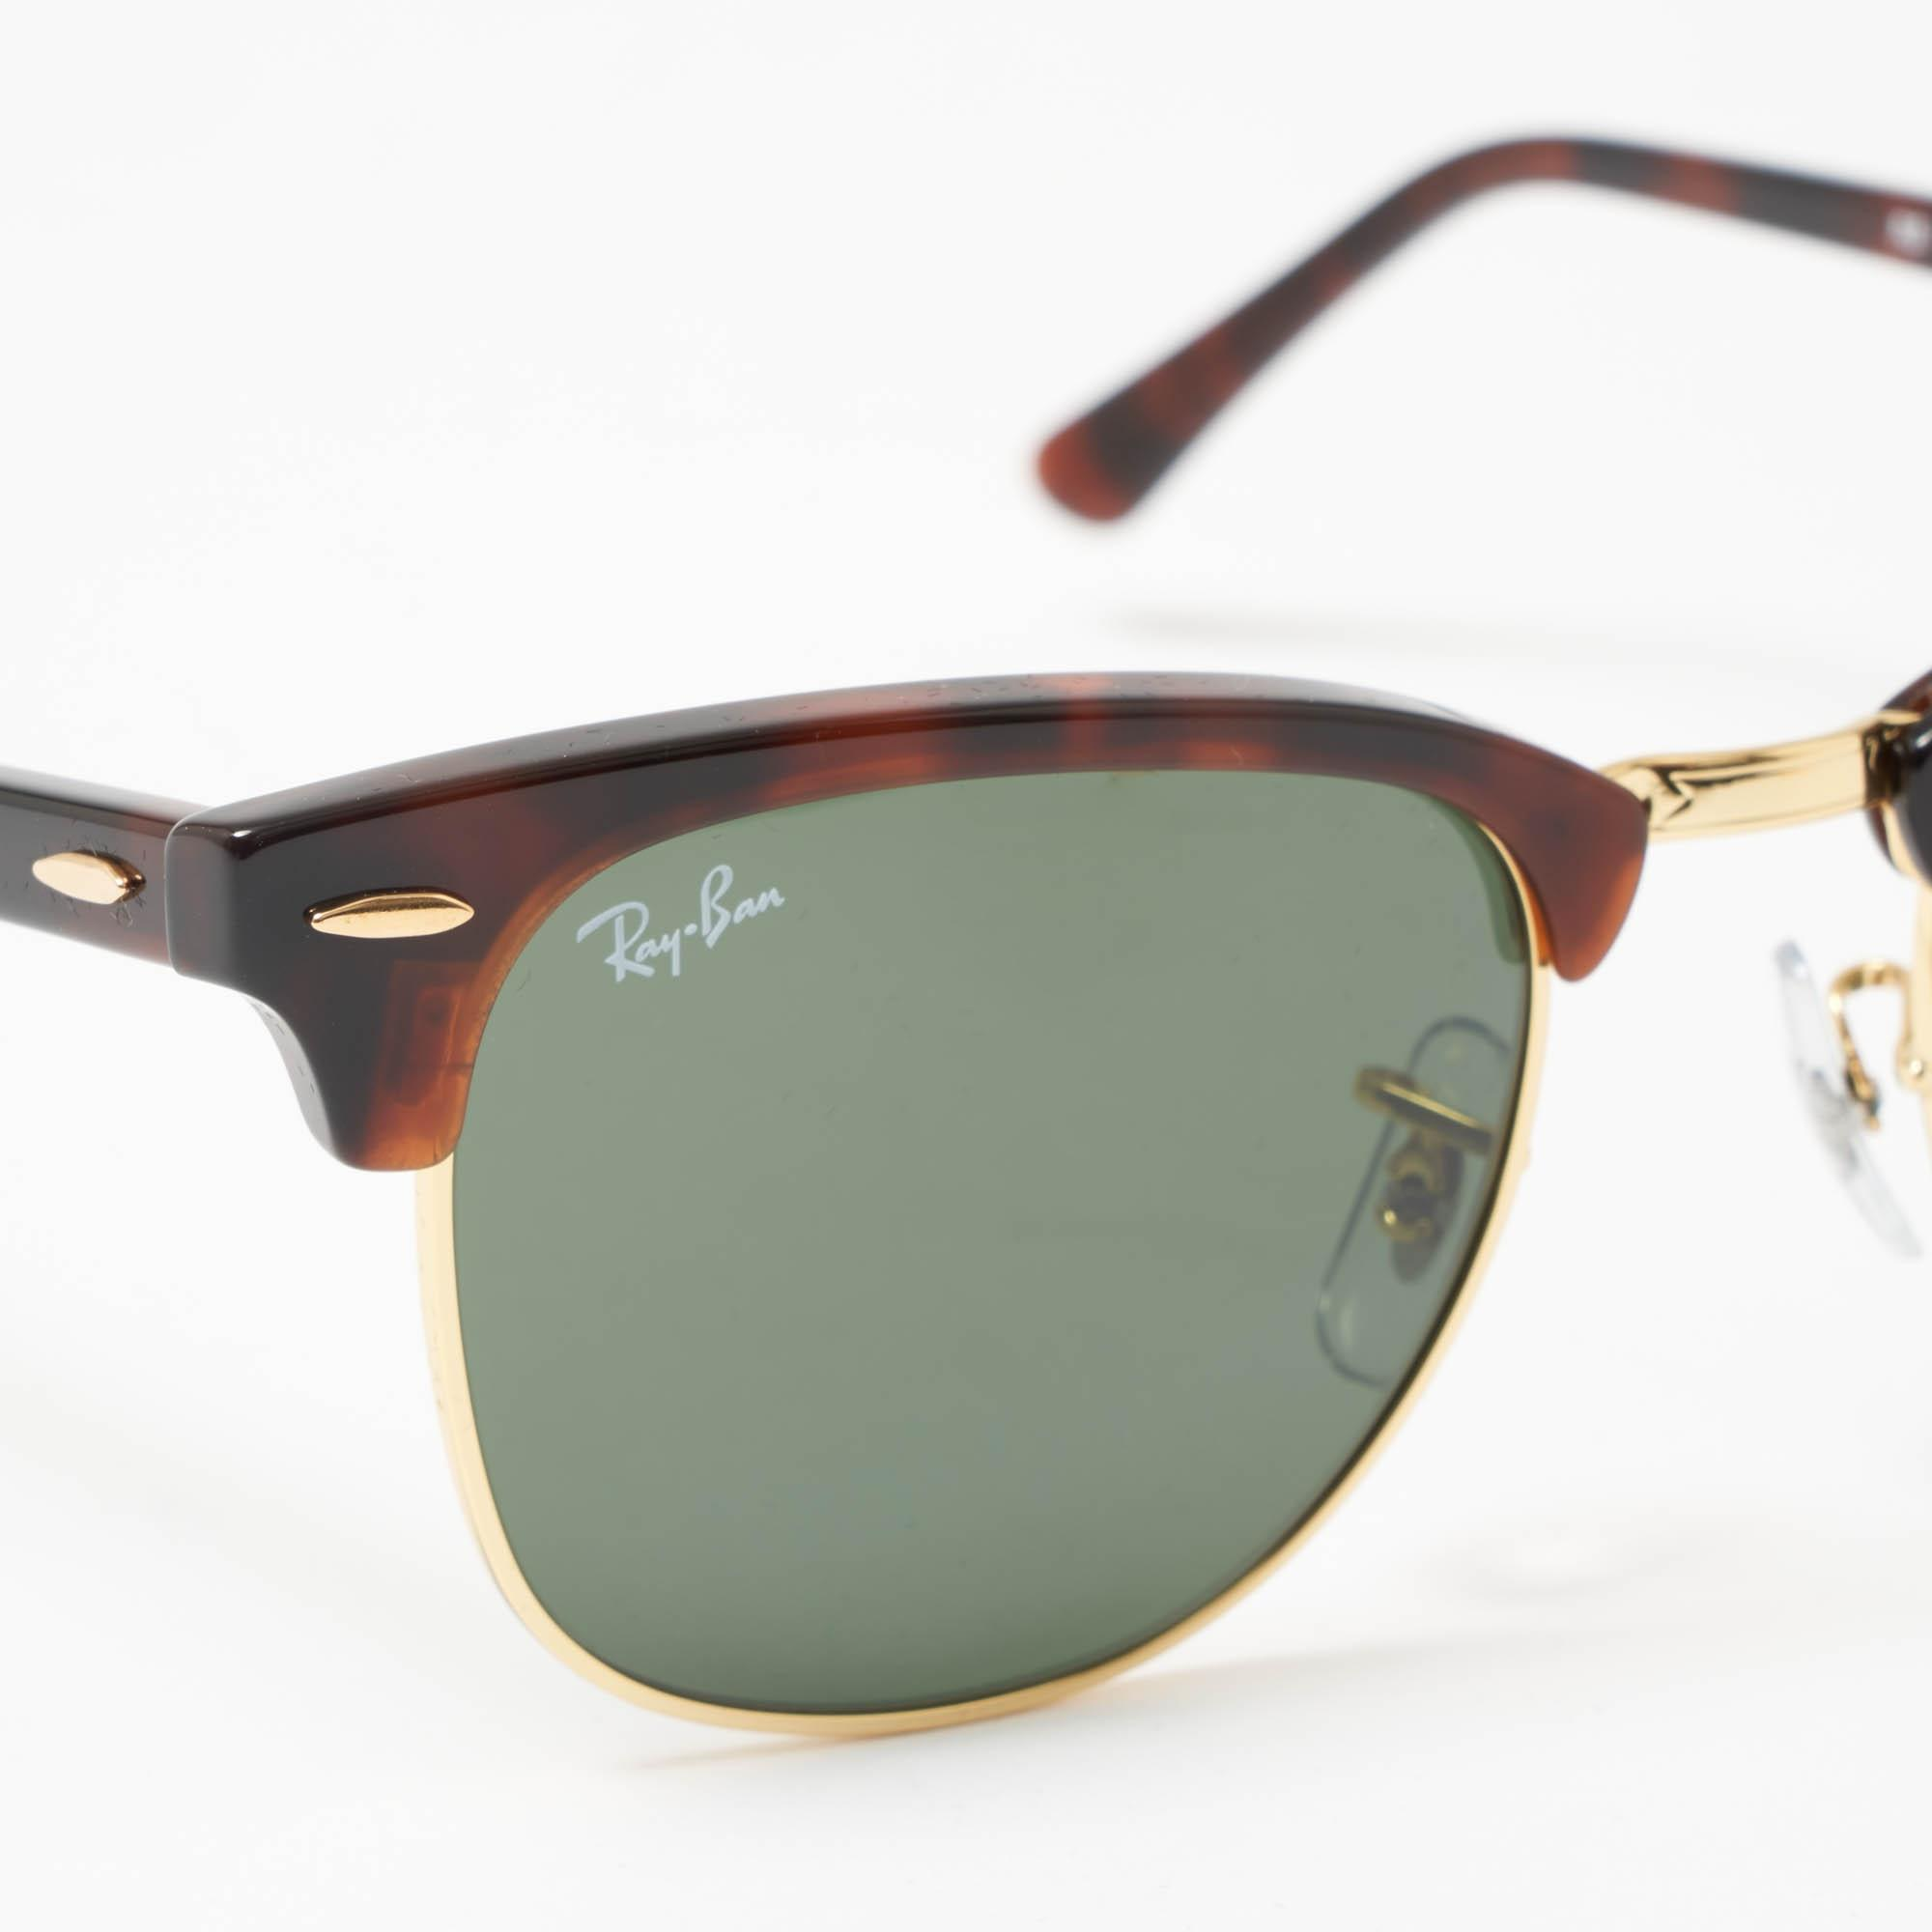 30bce4b996c ... Tortoise Classic Clubmaster Sunglasses - Classic G15 Lenses for Men -.  View fullscreen